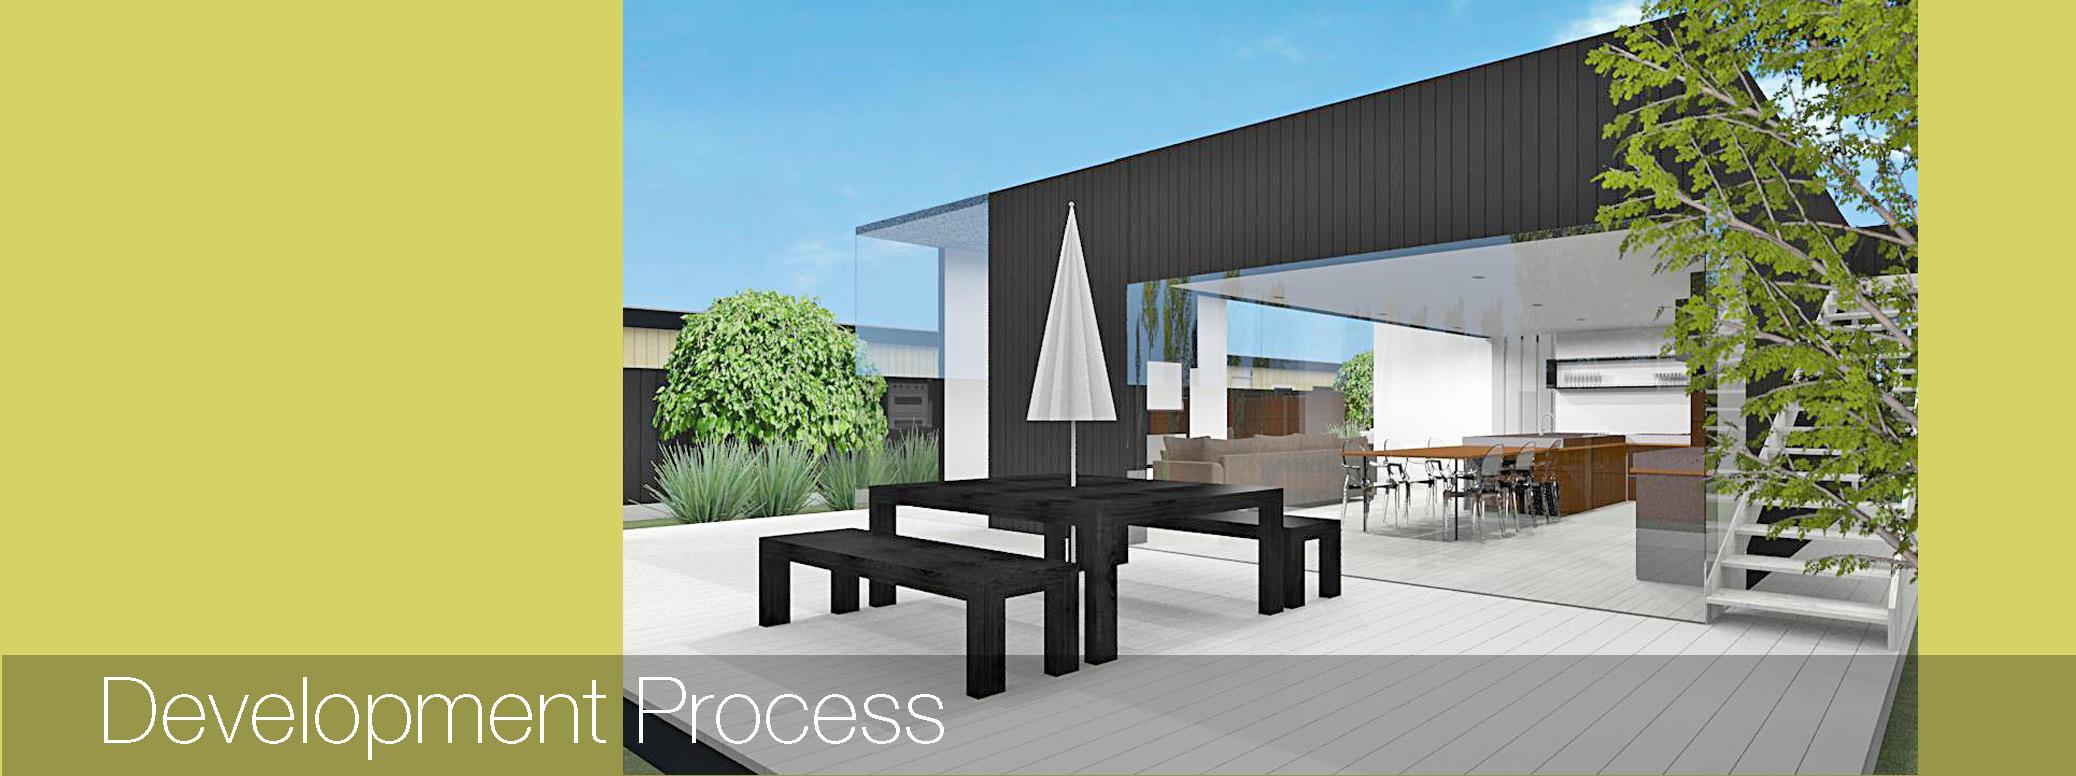 Development process copy